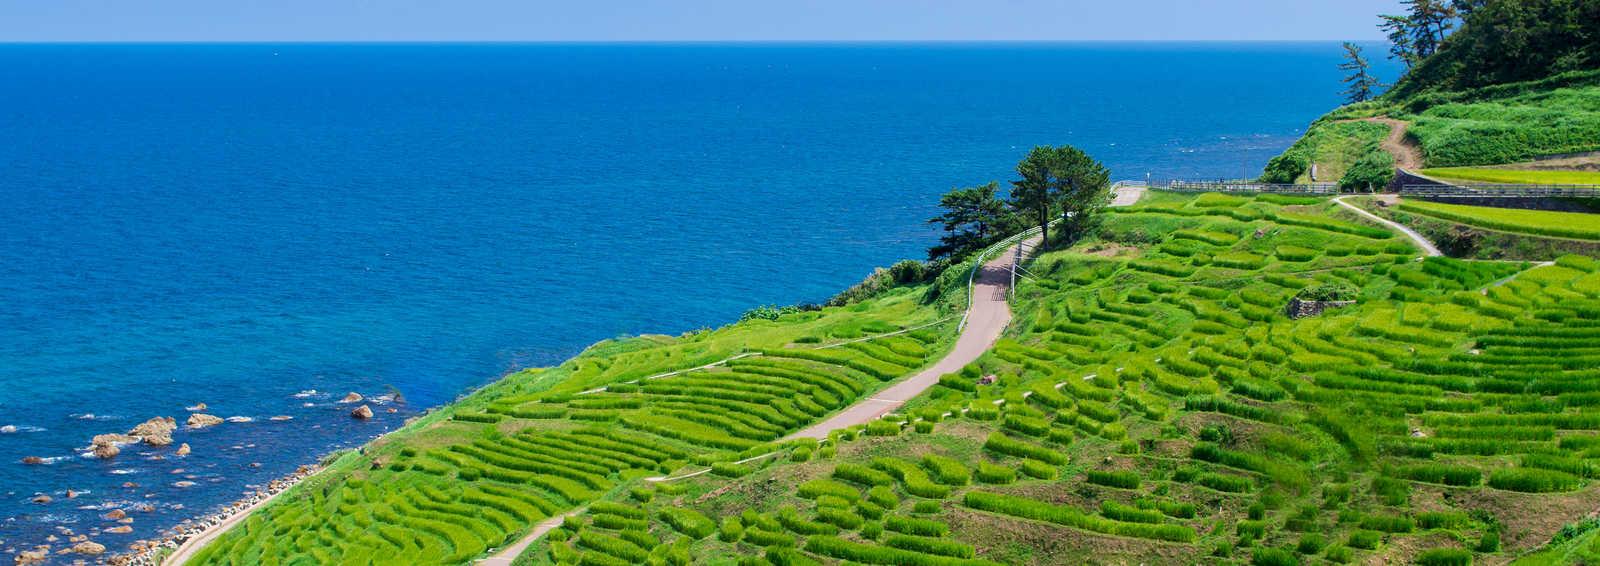 Rice paddy field along the coast, Japan